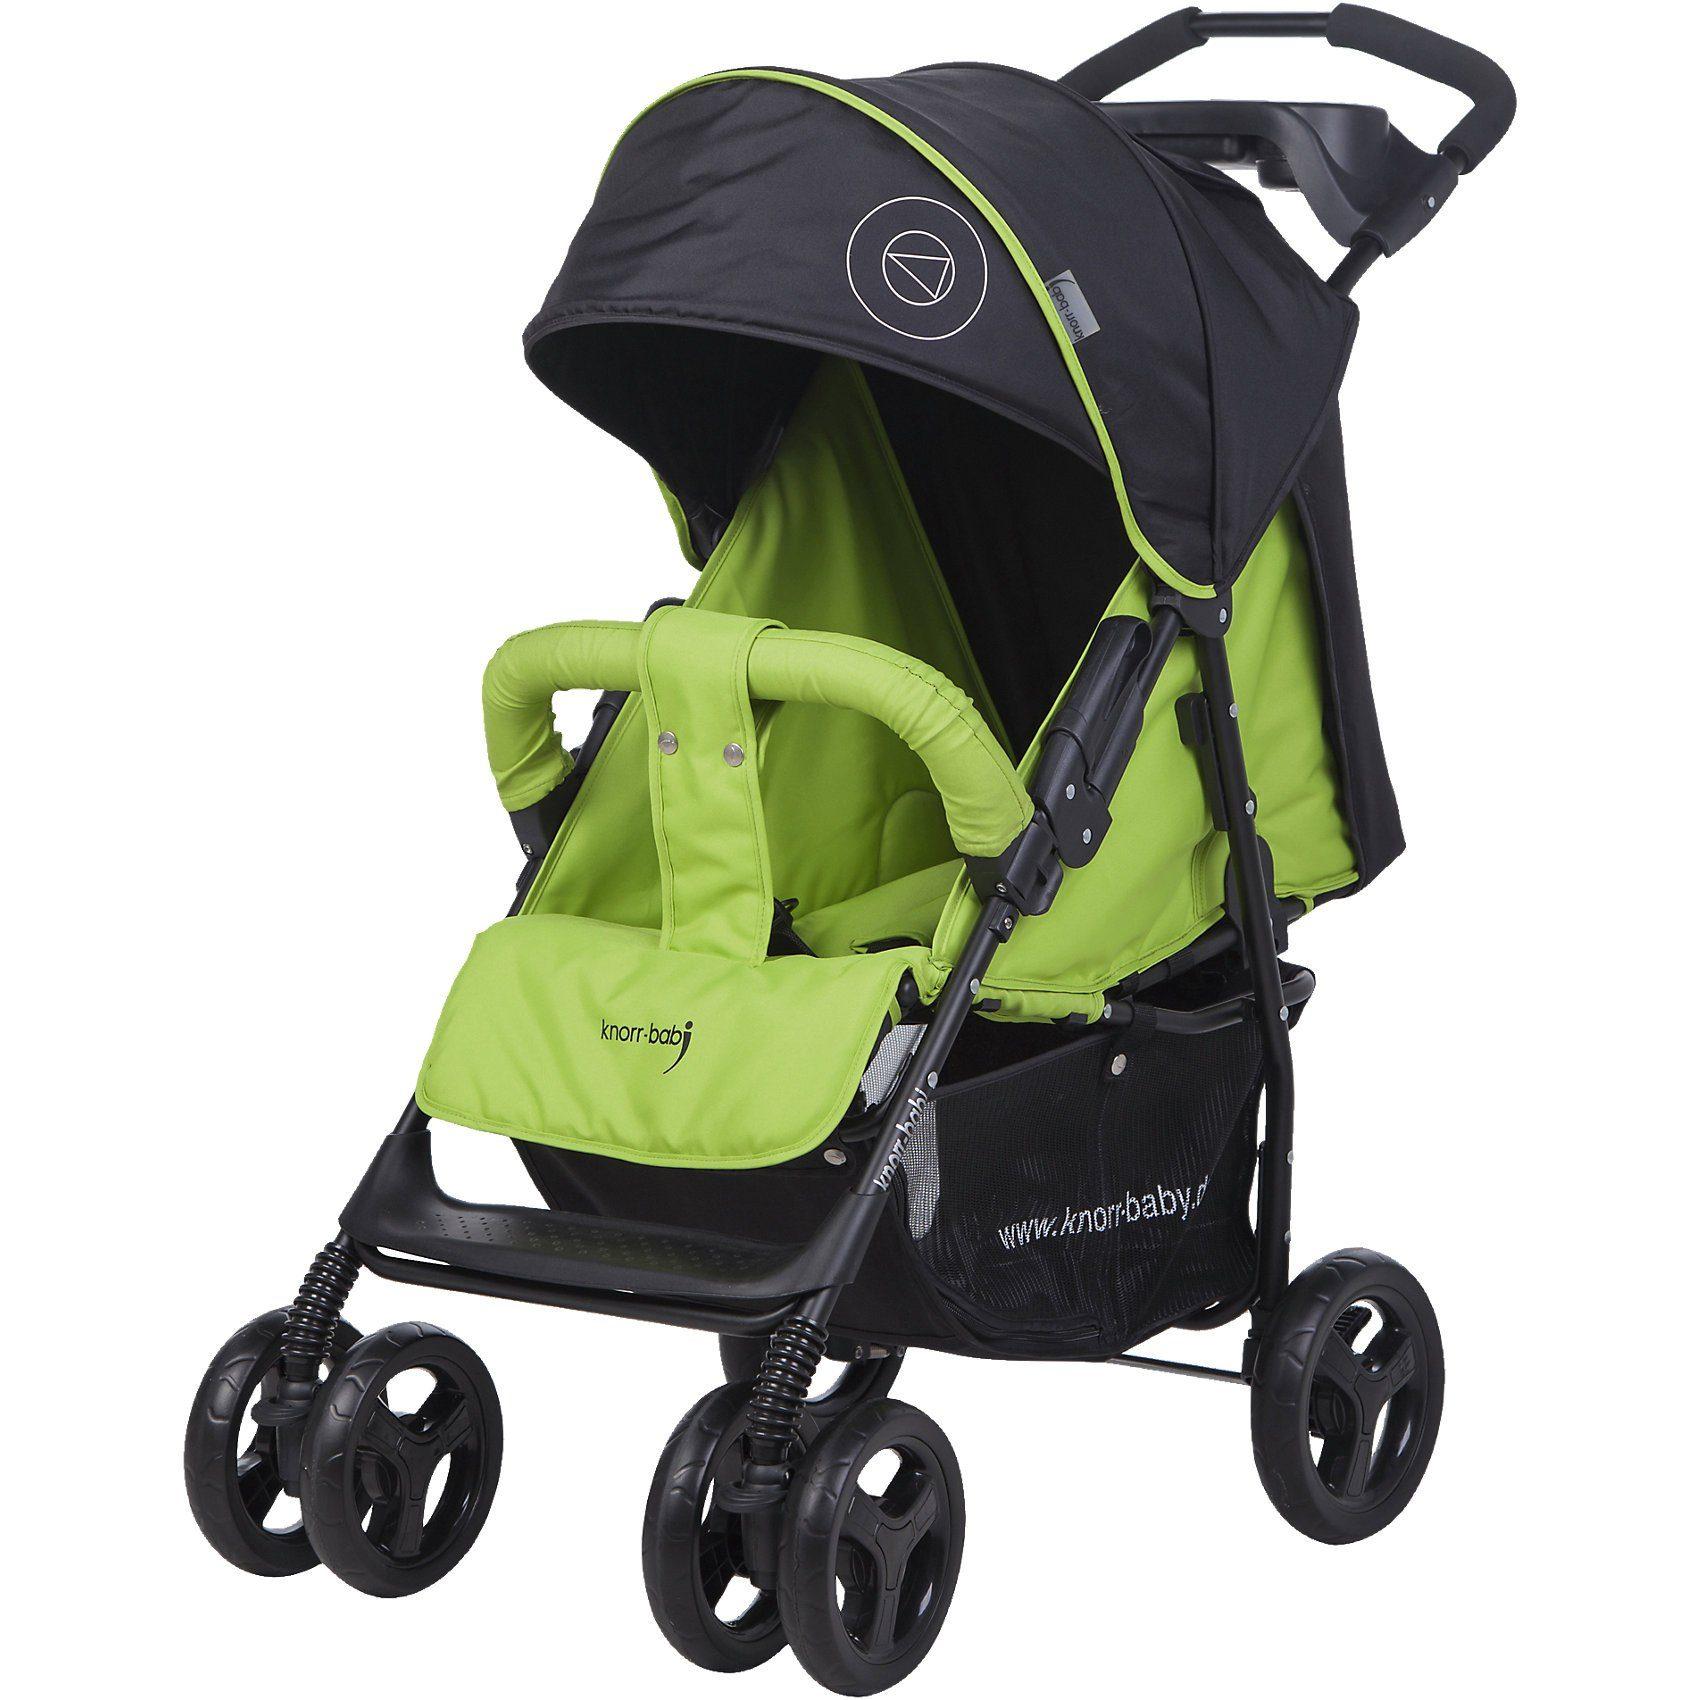 knorr-baby Sportwagen Vero XL Happy Colour, grün